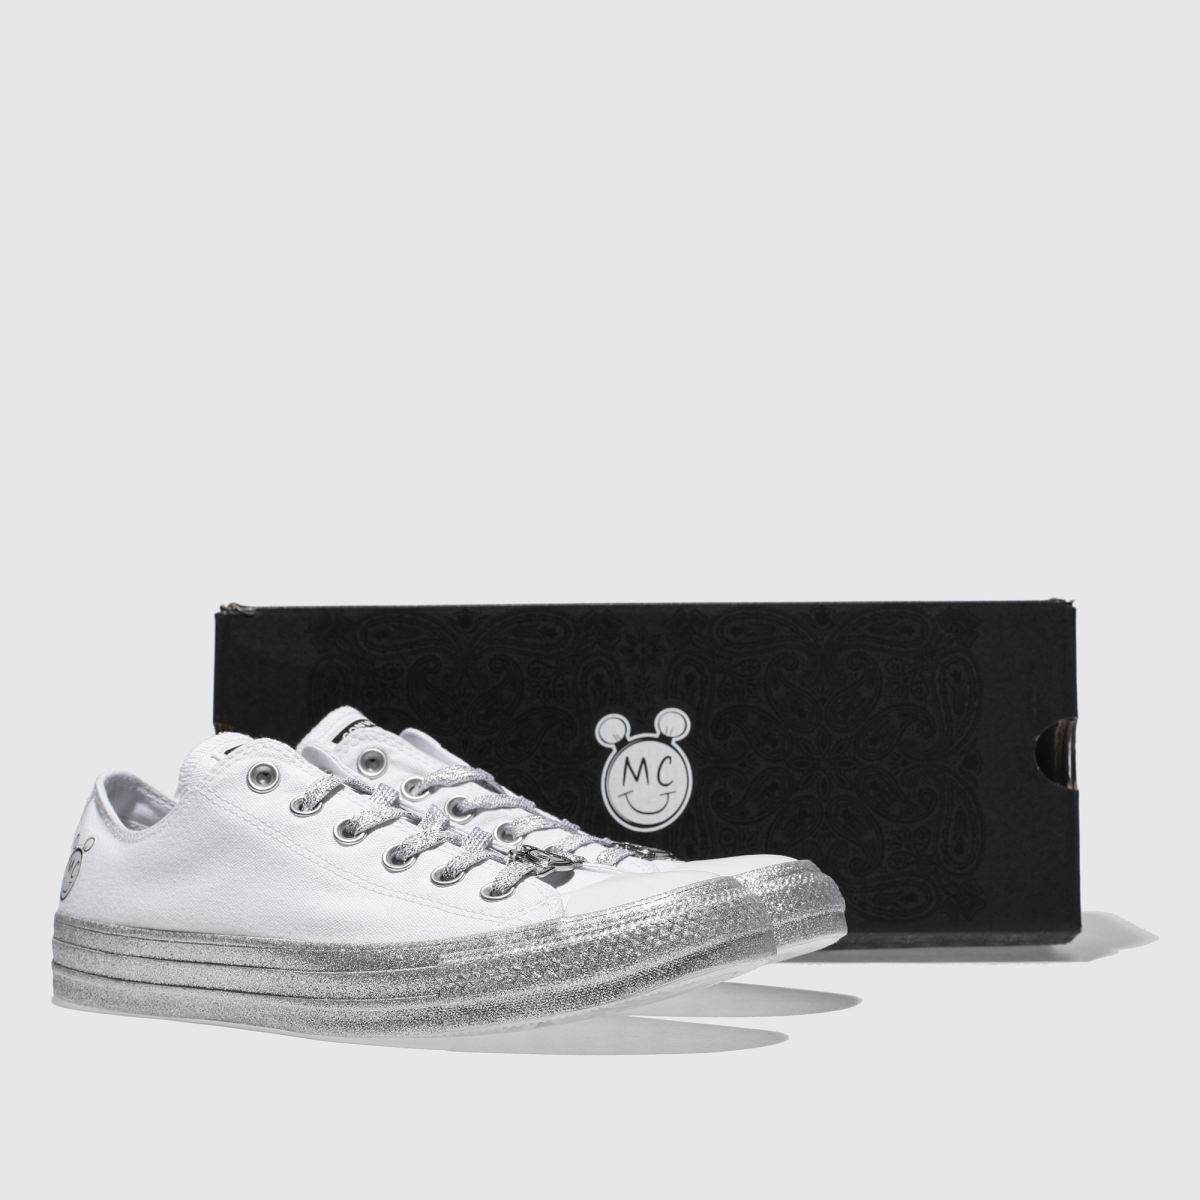 Damen Weiß-silber converse All Star Miley Cyrus Ox Sneaker beliebte | schuh Gute Qualität beliebte Sneaker Schuhe bfb9cc